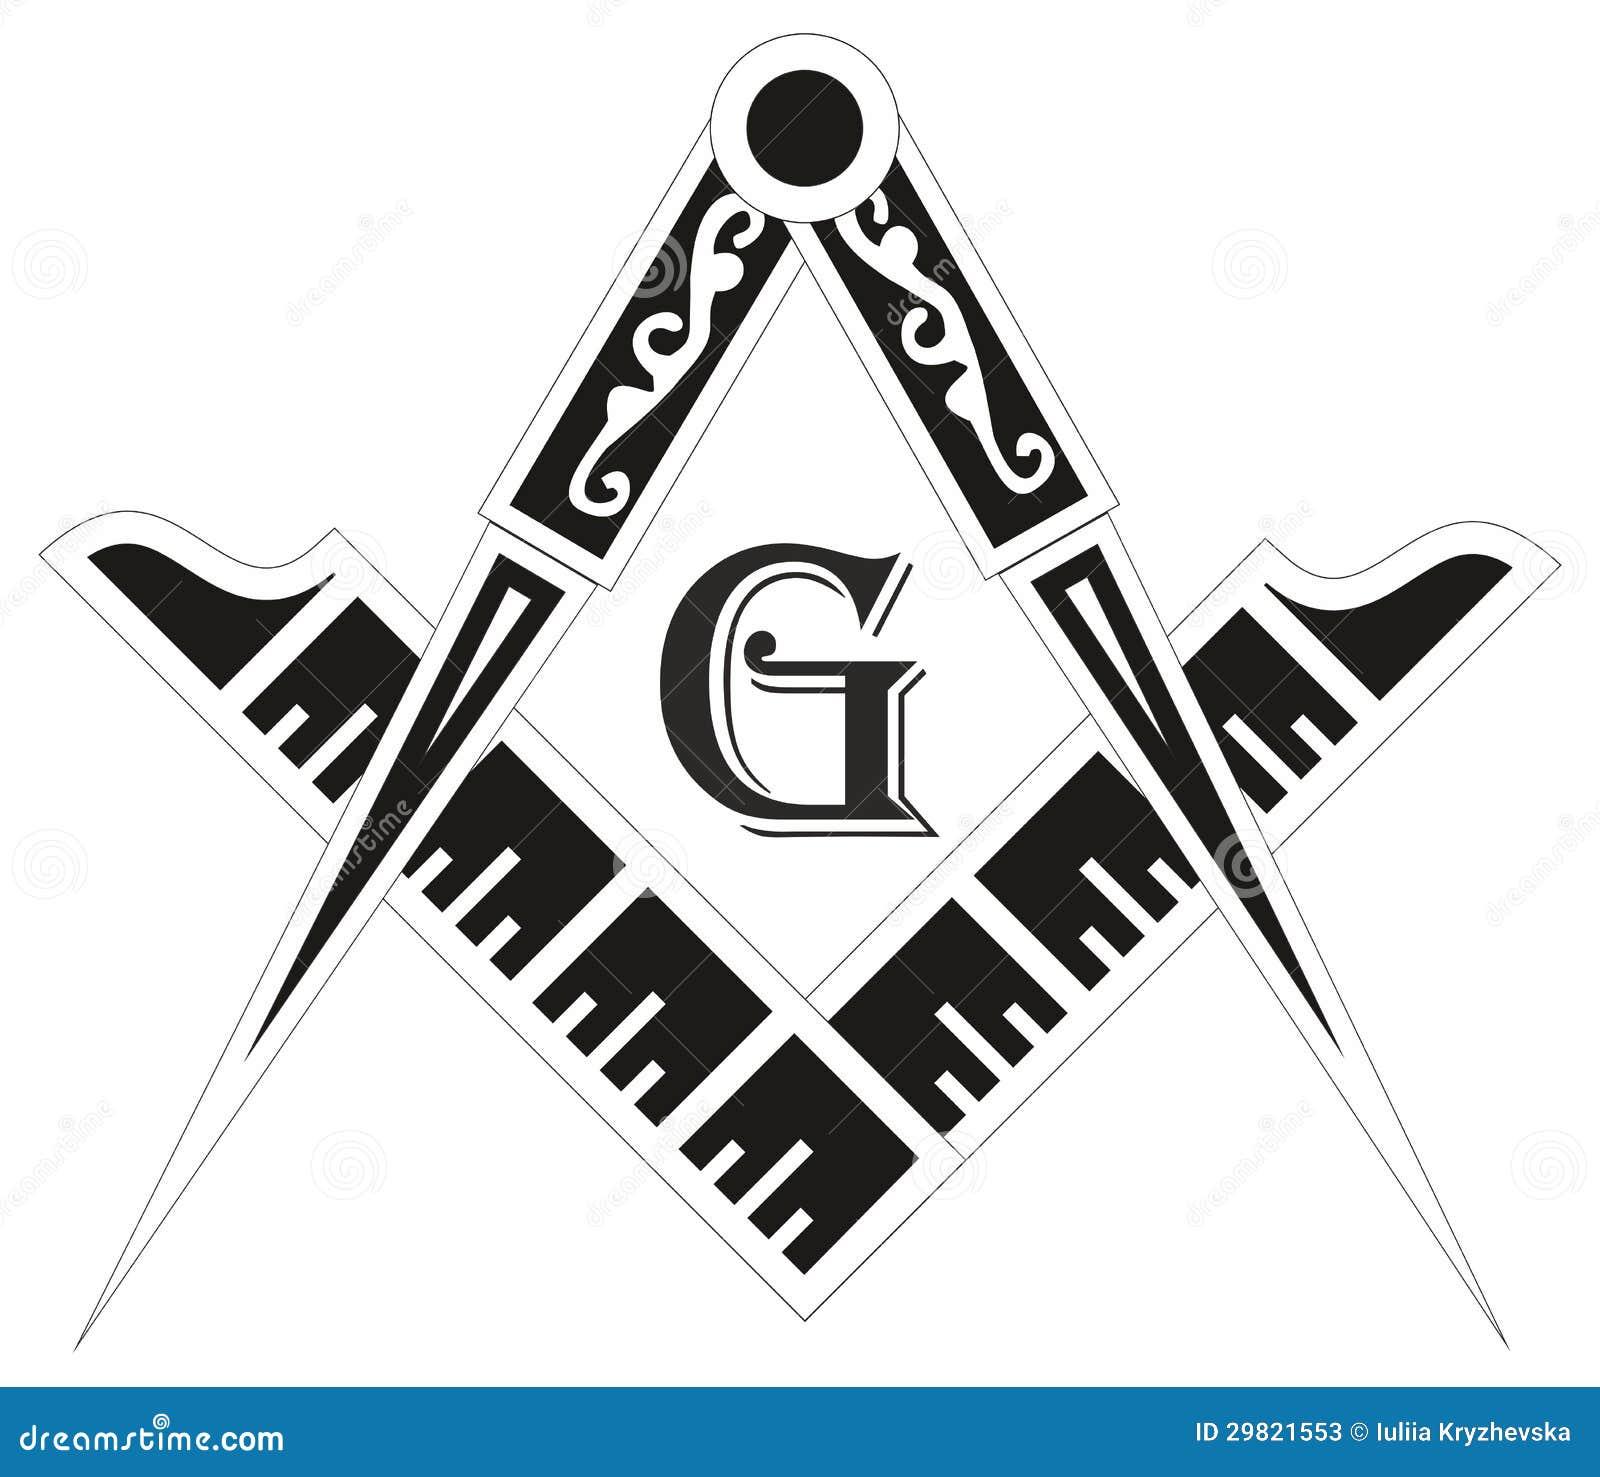 Freemasonry Emblem The Masonic Square And Compass Symbol